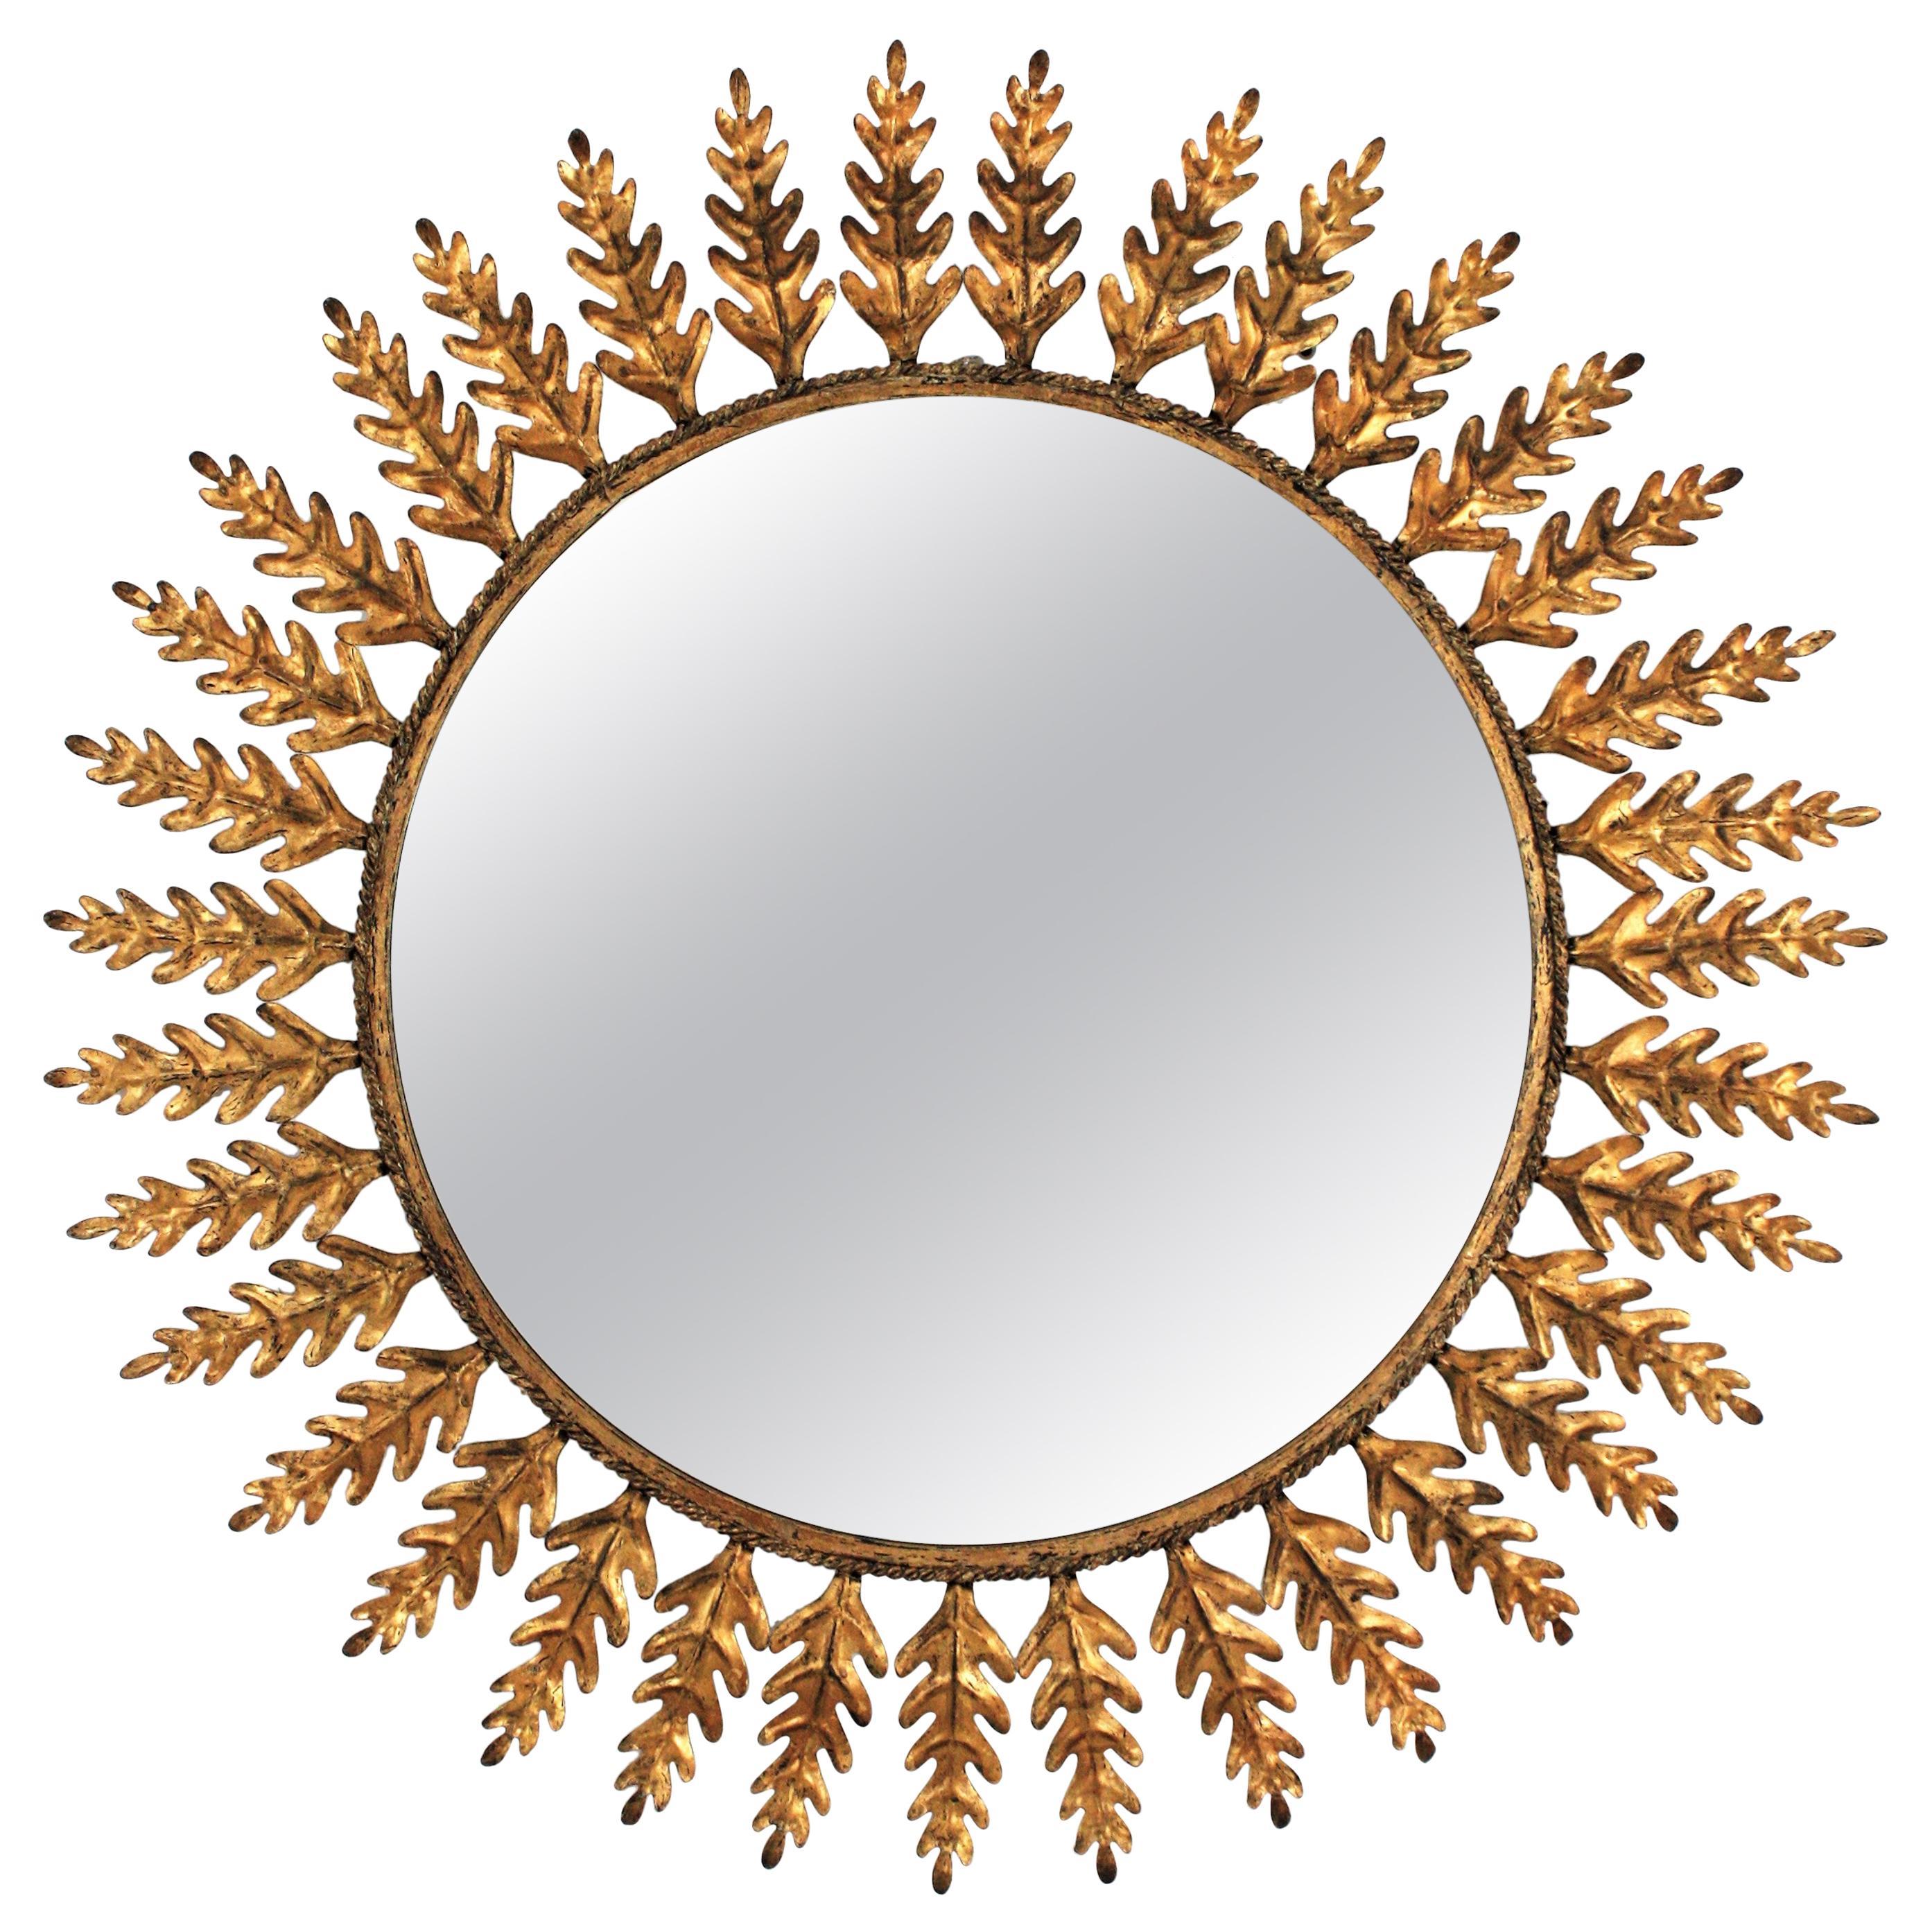 Sunburst Mirror with Leaves Frame in Gilt Metal, Spain, 1960s